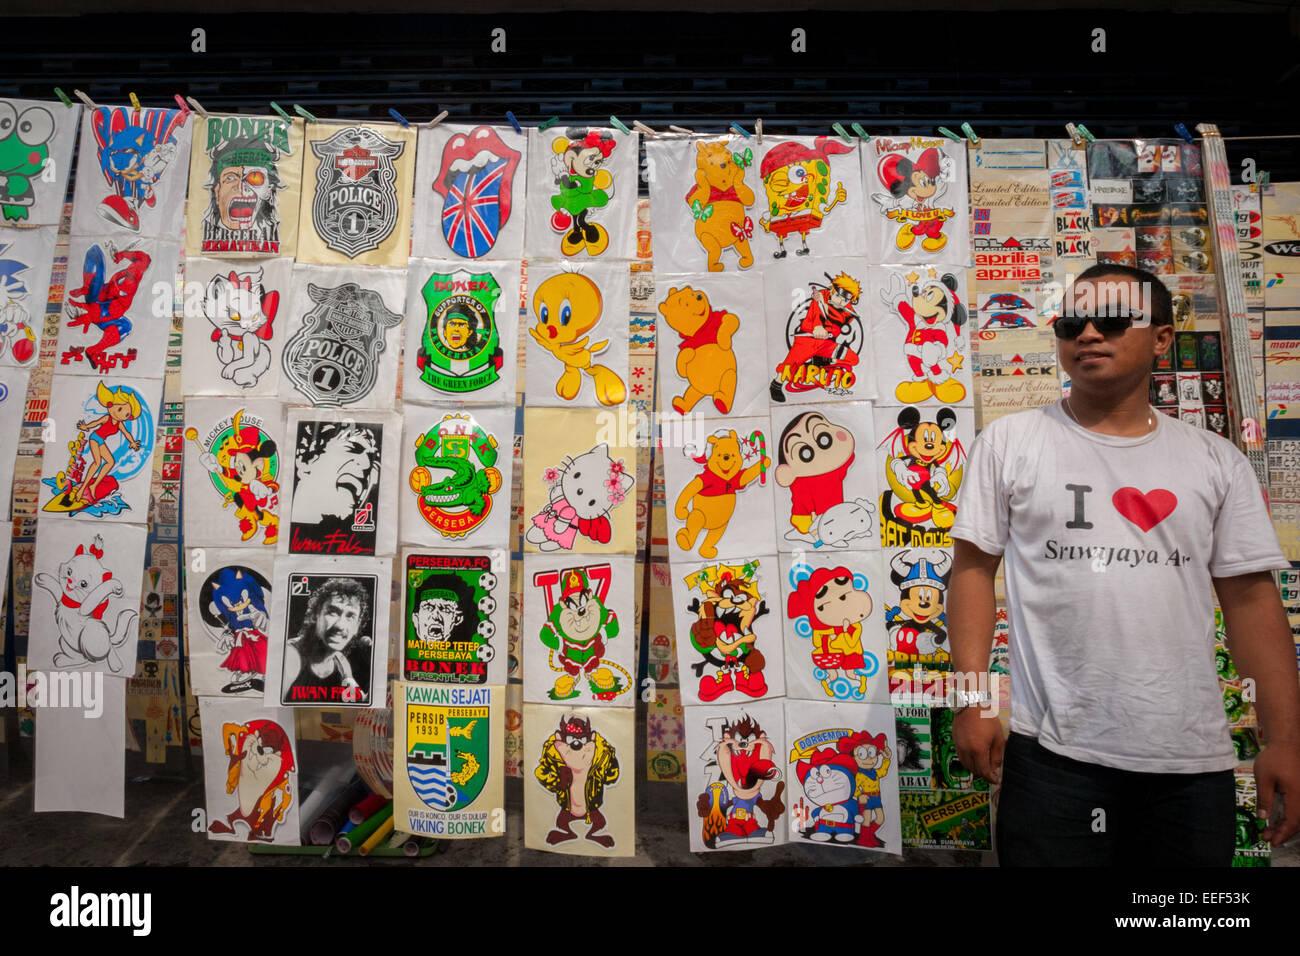 Unofficial fictional character stickers vendor at Surabaya Sunday market near Tugu Pahlawan (heroes monument). Stock Photo